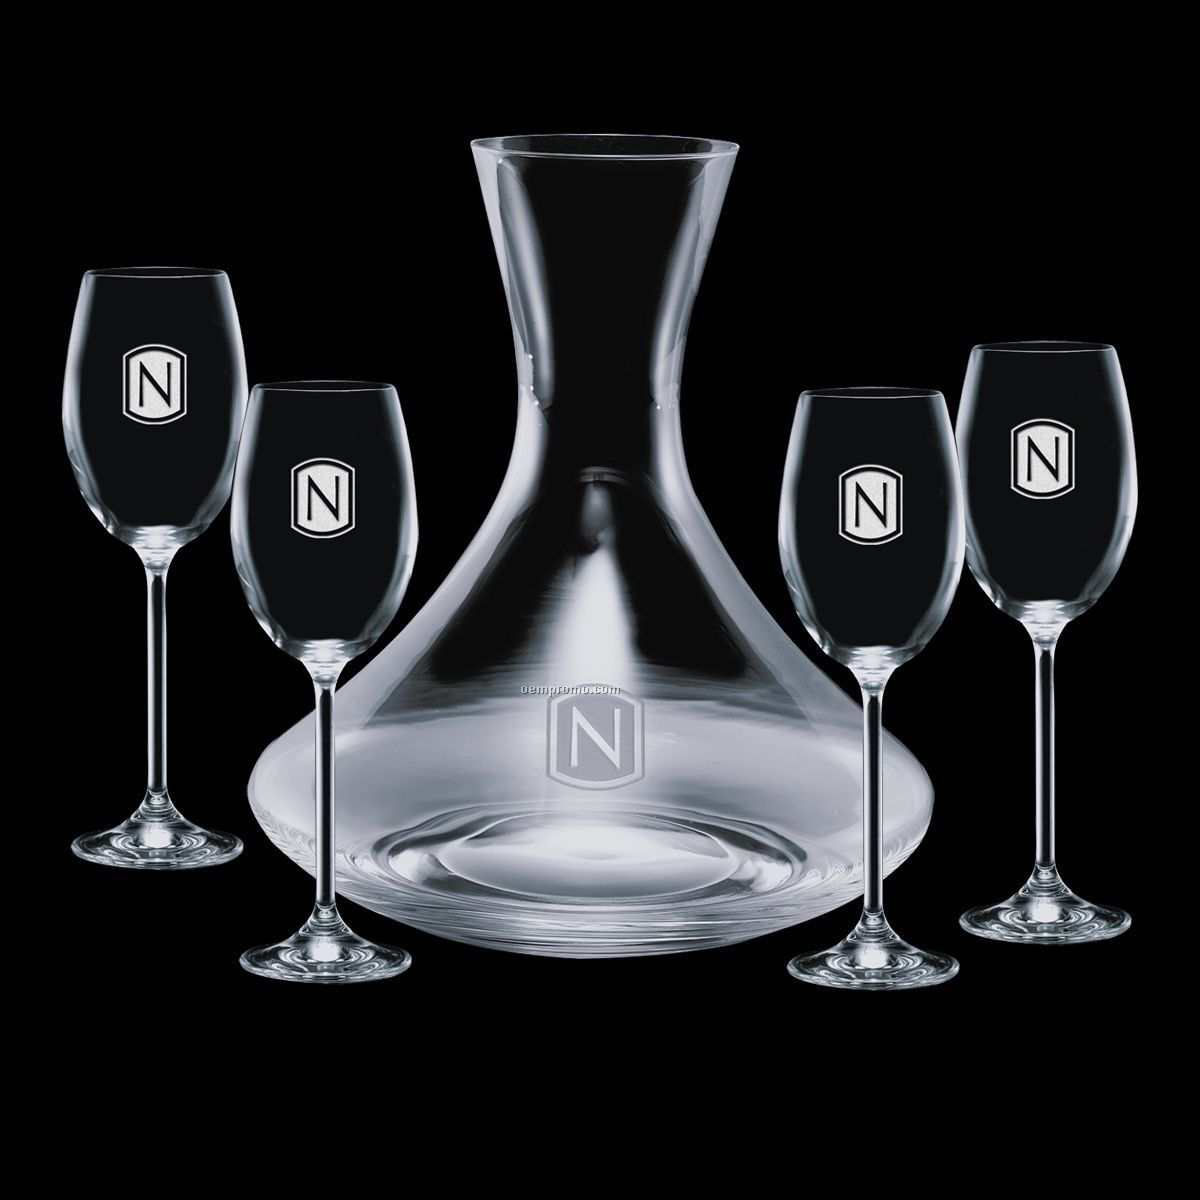 32 Oz. Crystal Senderwood Carafe With 4 Wine Glasses